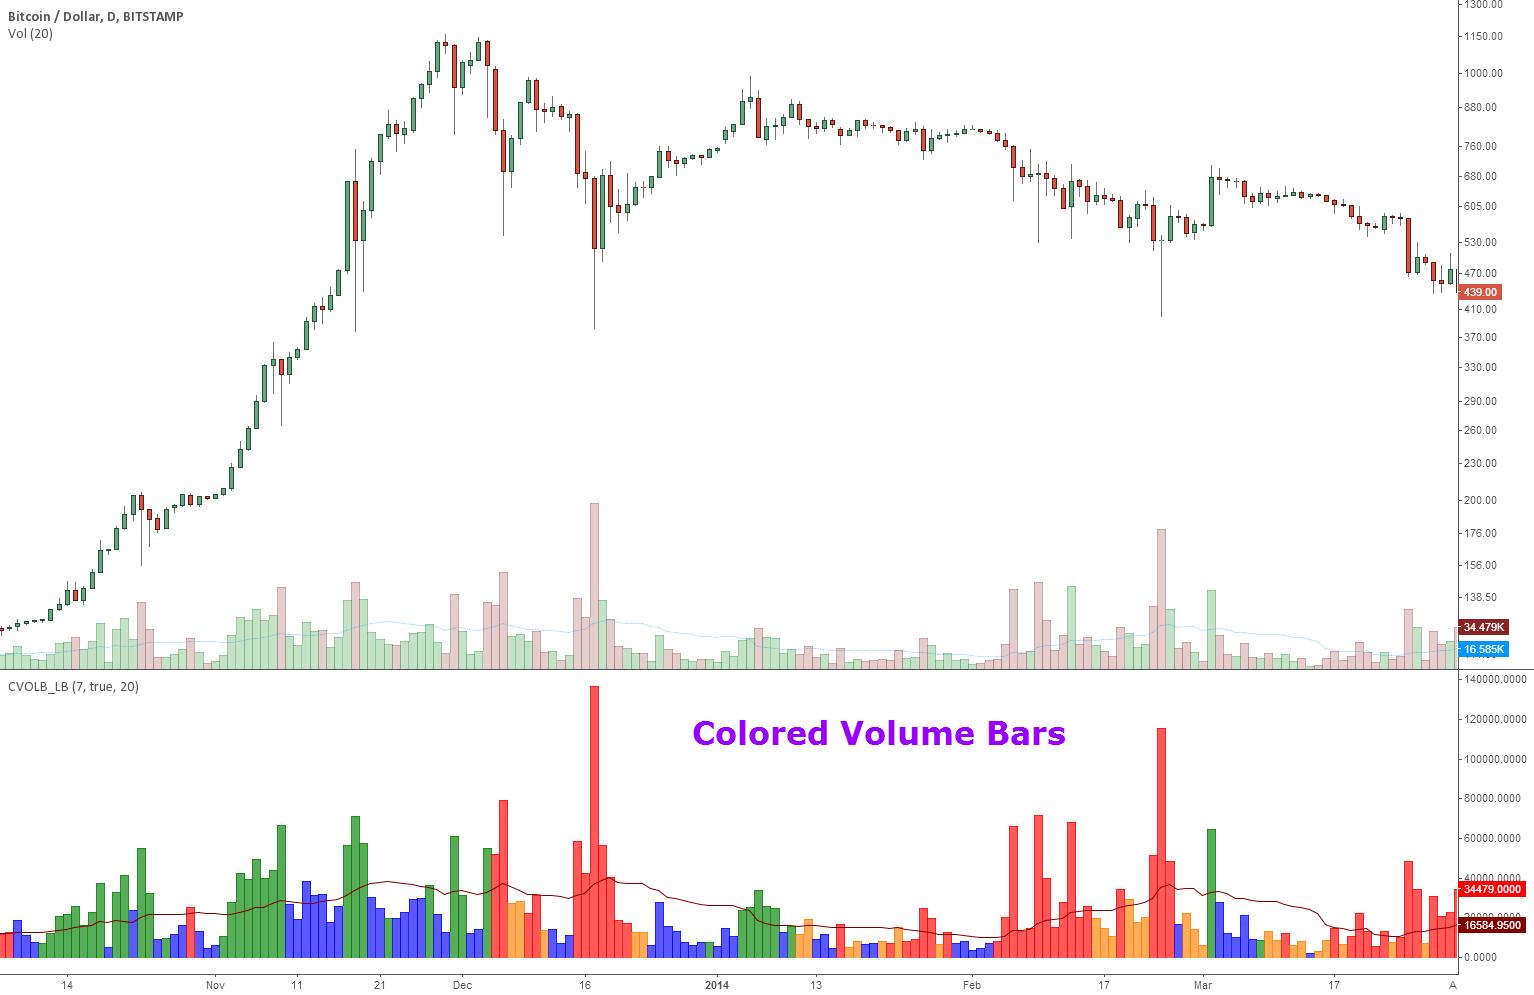 Colored Volume Bars [LazyBear]